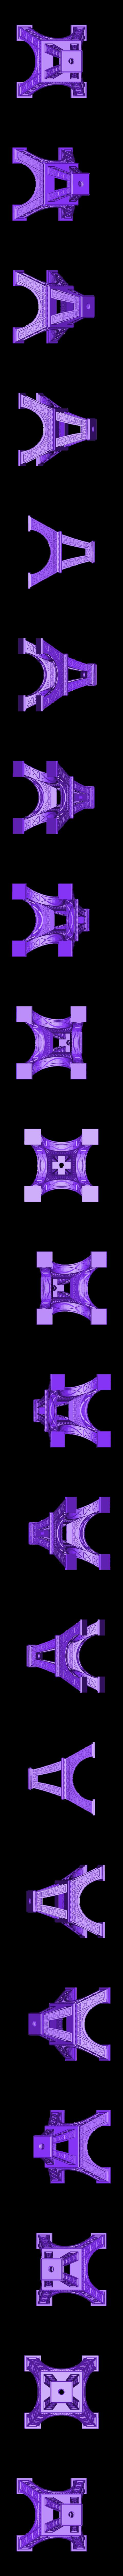 eiffel_B1.stl Download free STL file Eiffel tower lamp • 3D printable object, Toolmoon